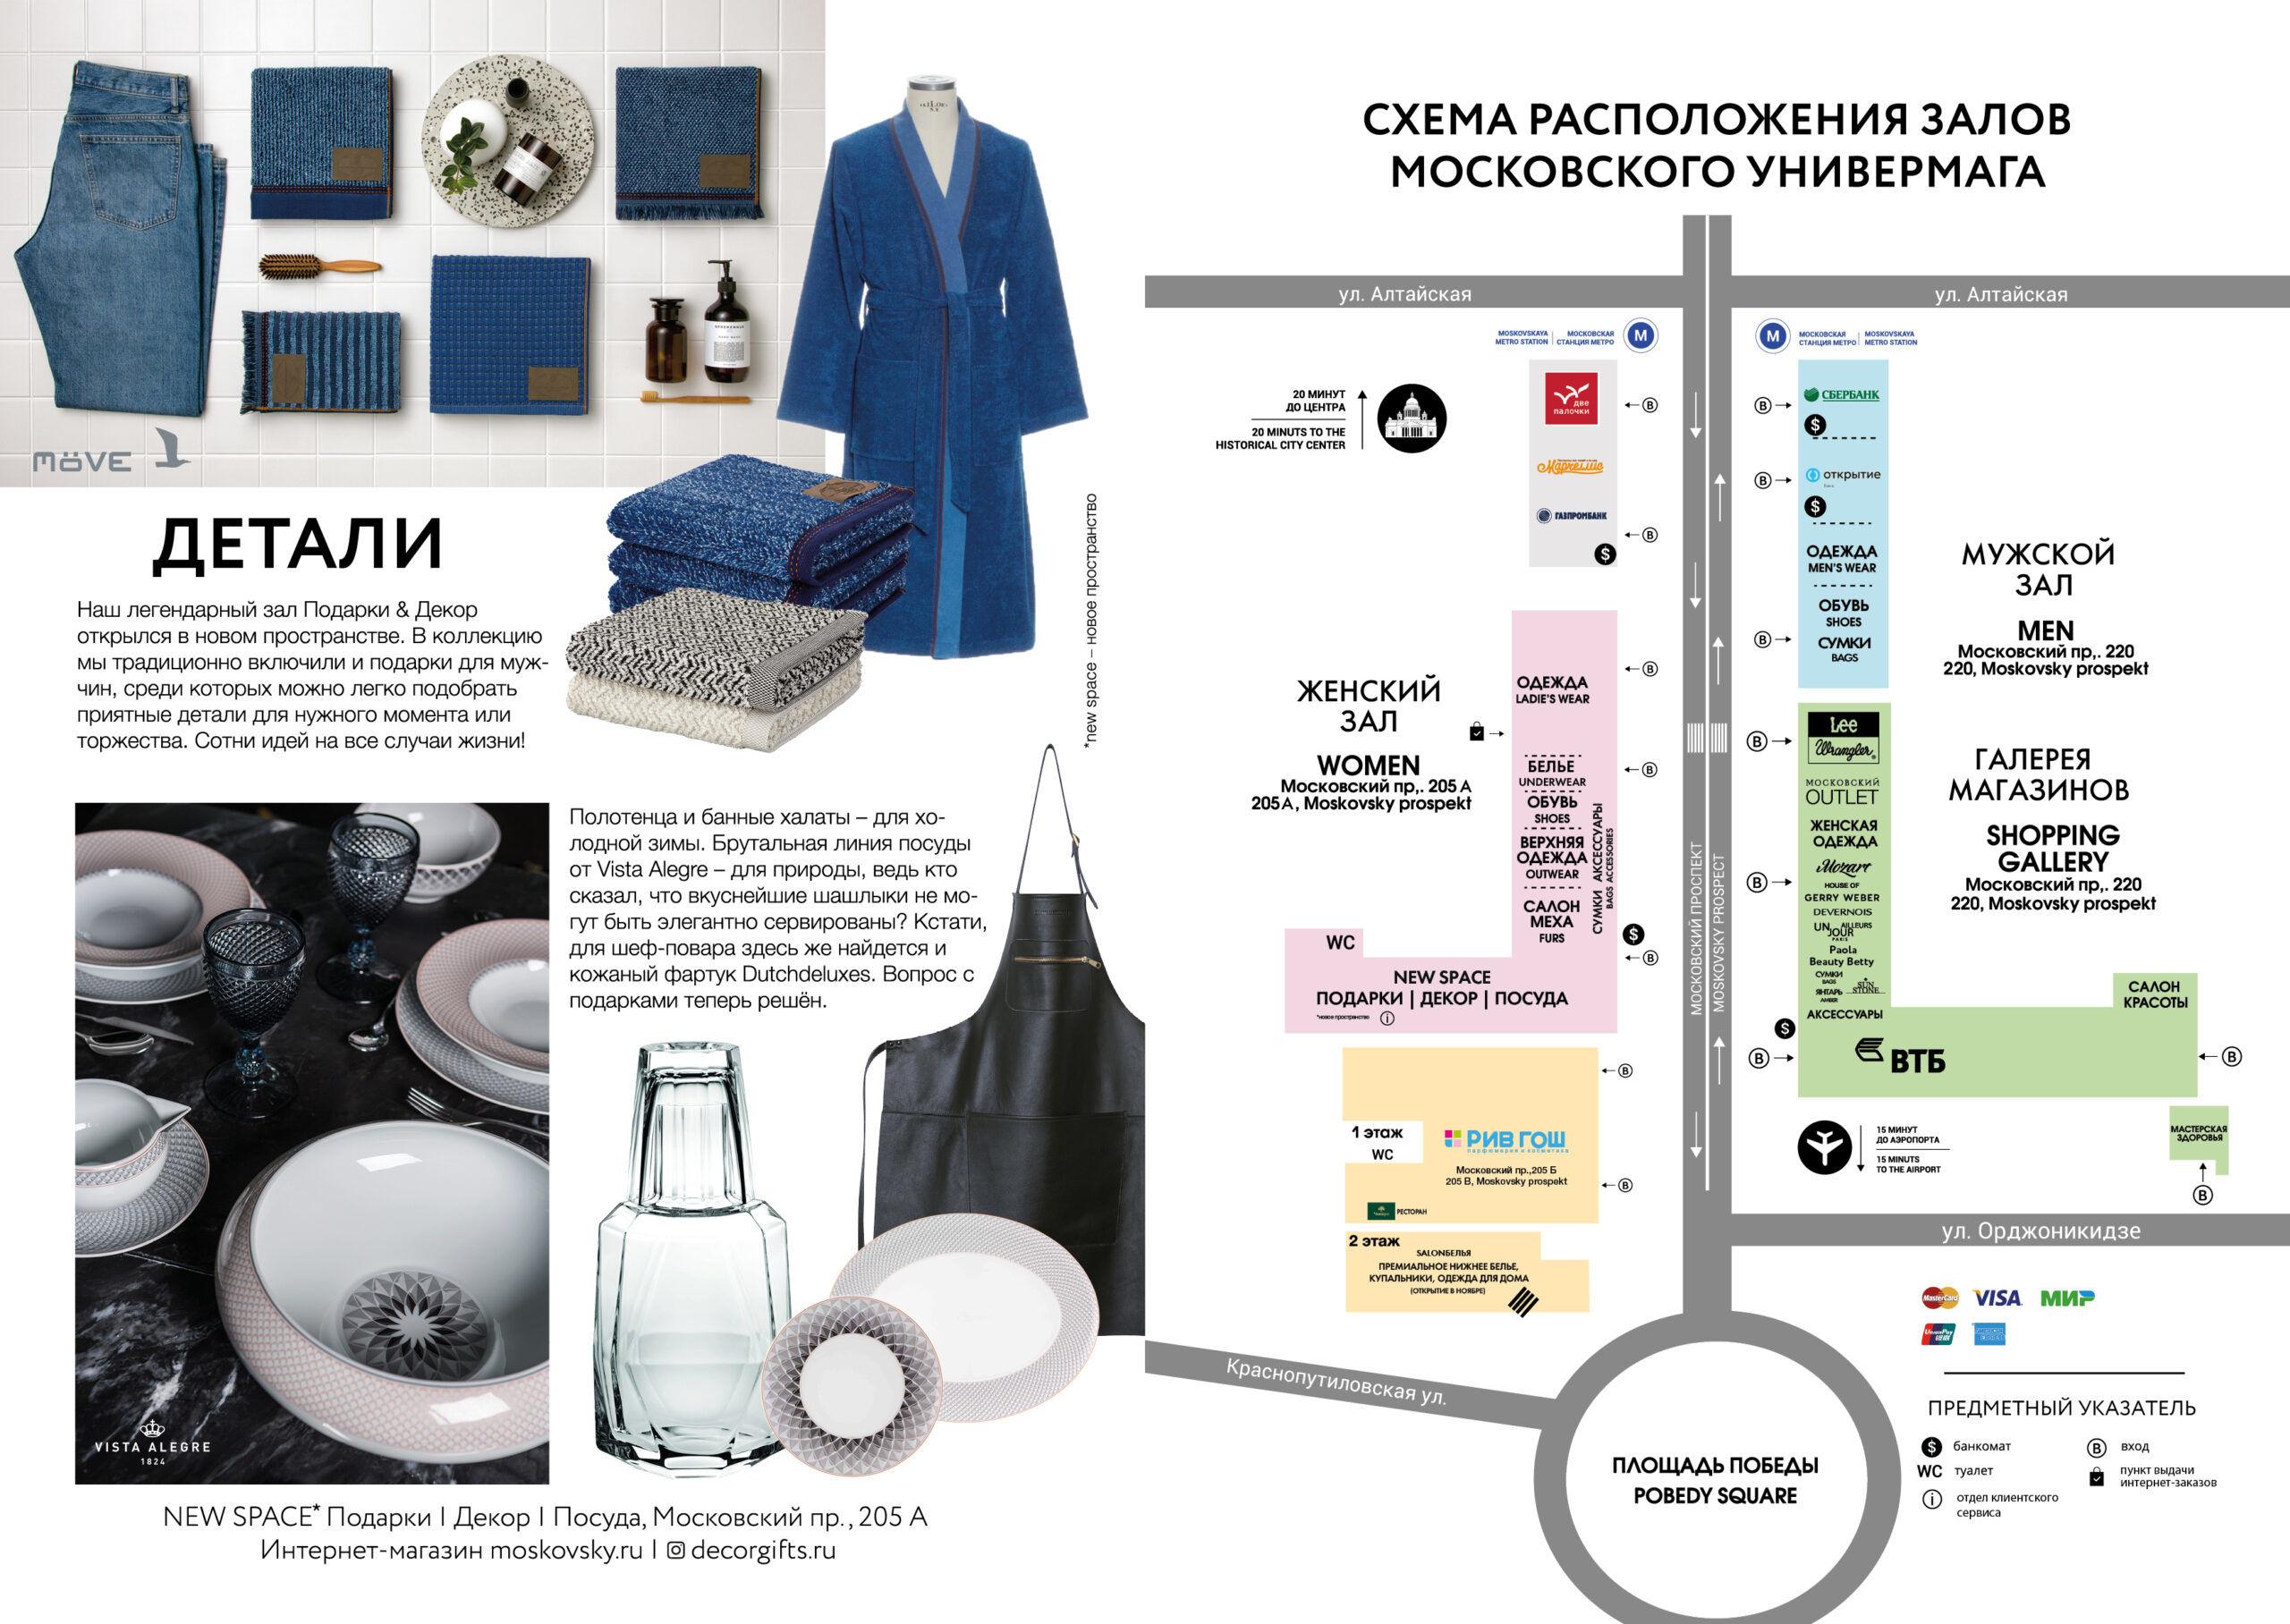 Московский каталог fw21-22_a5_МУЖ9